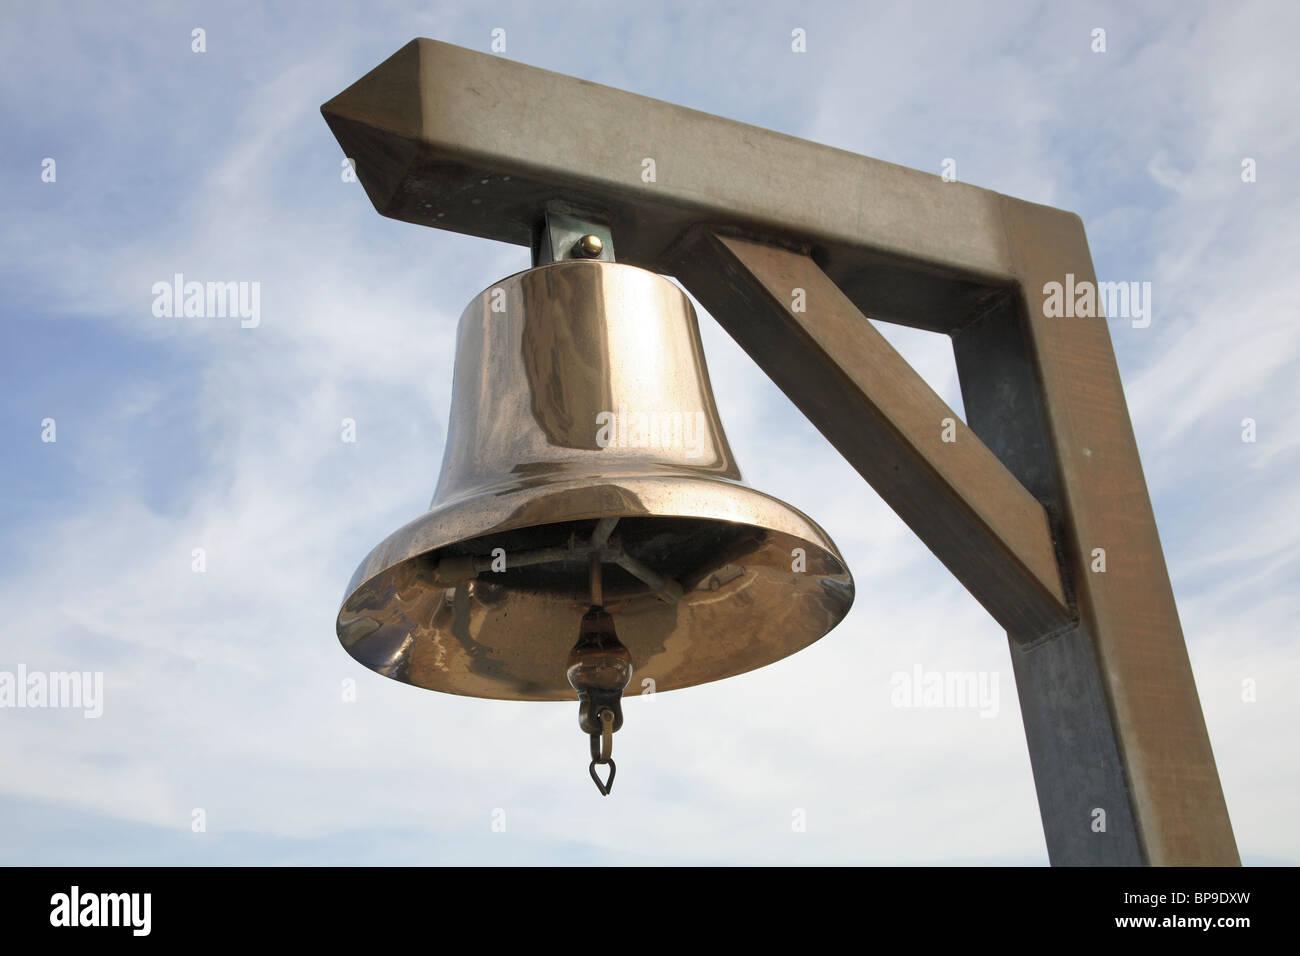 Ship's brass bell - Stock Image